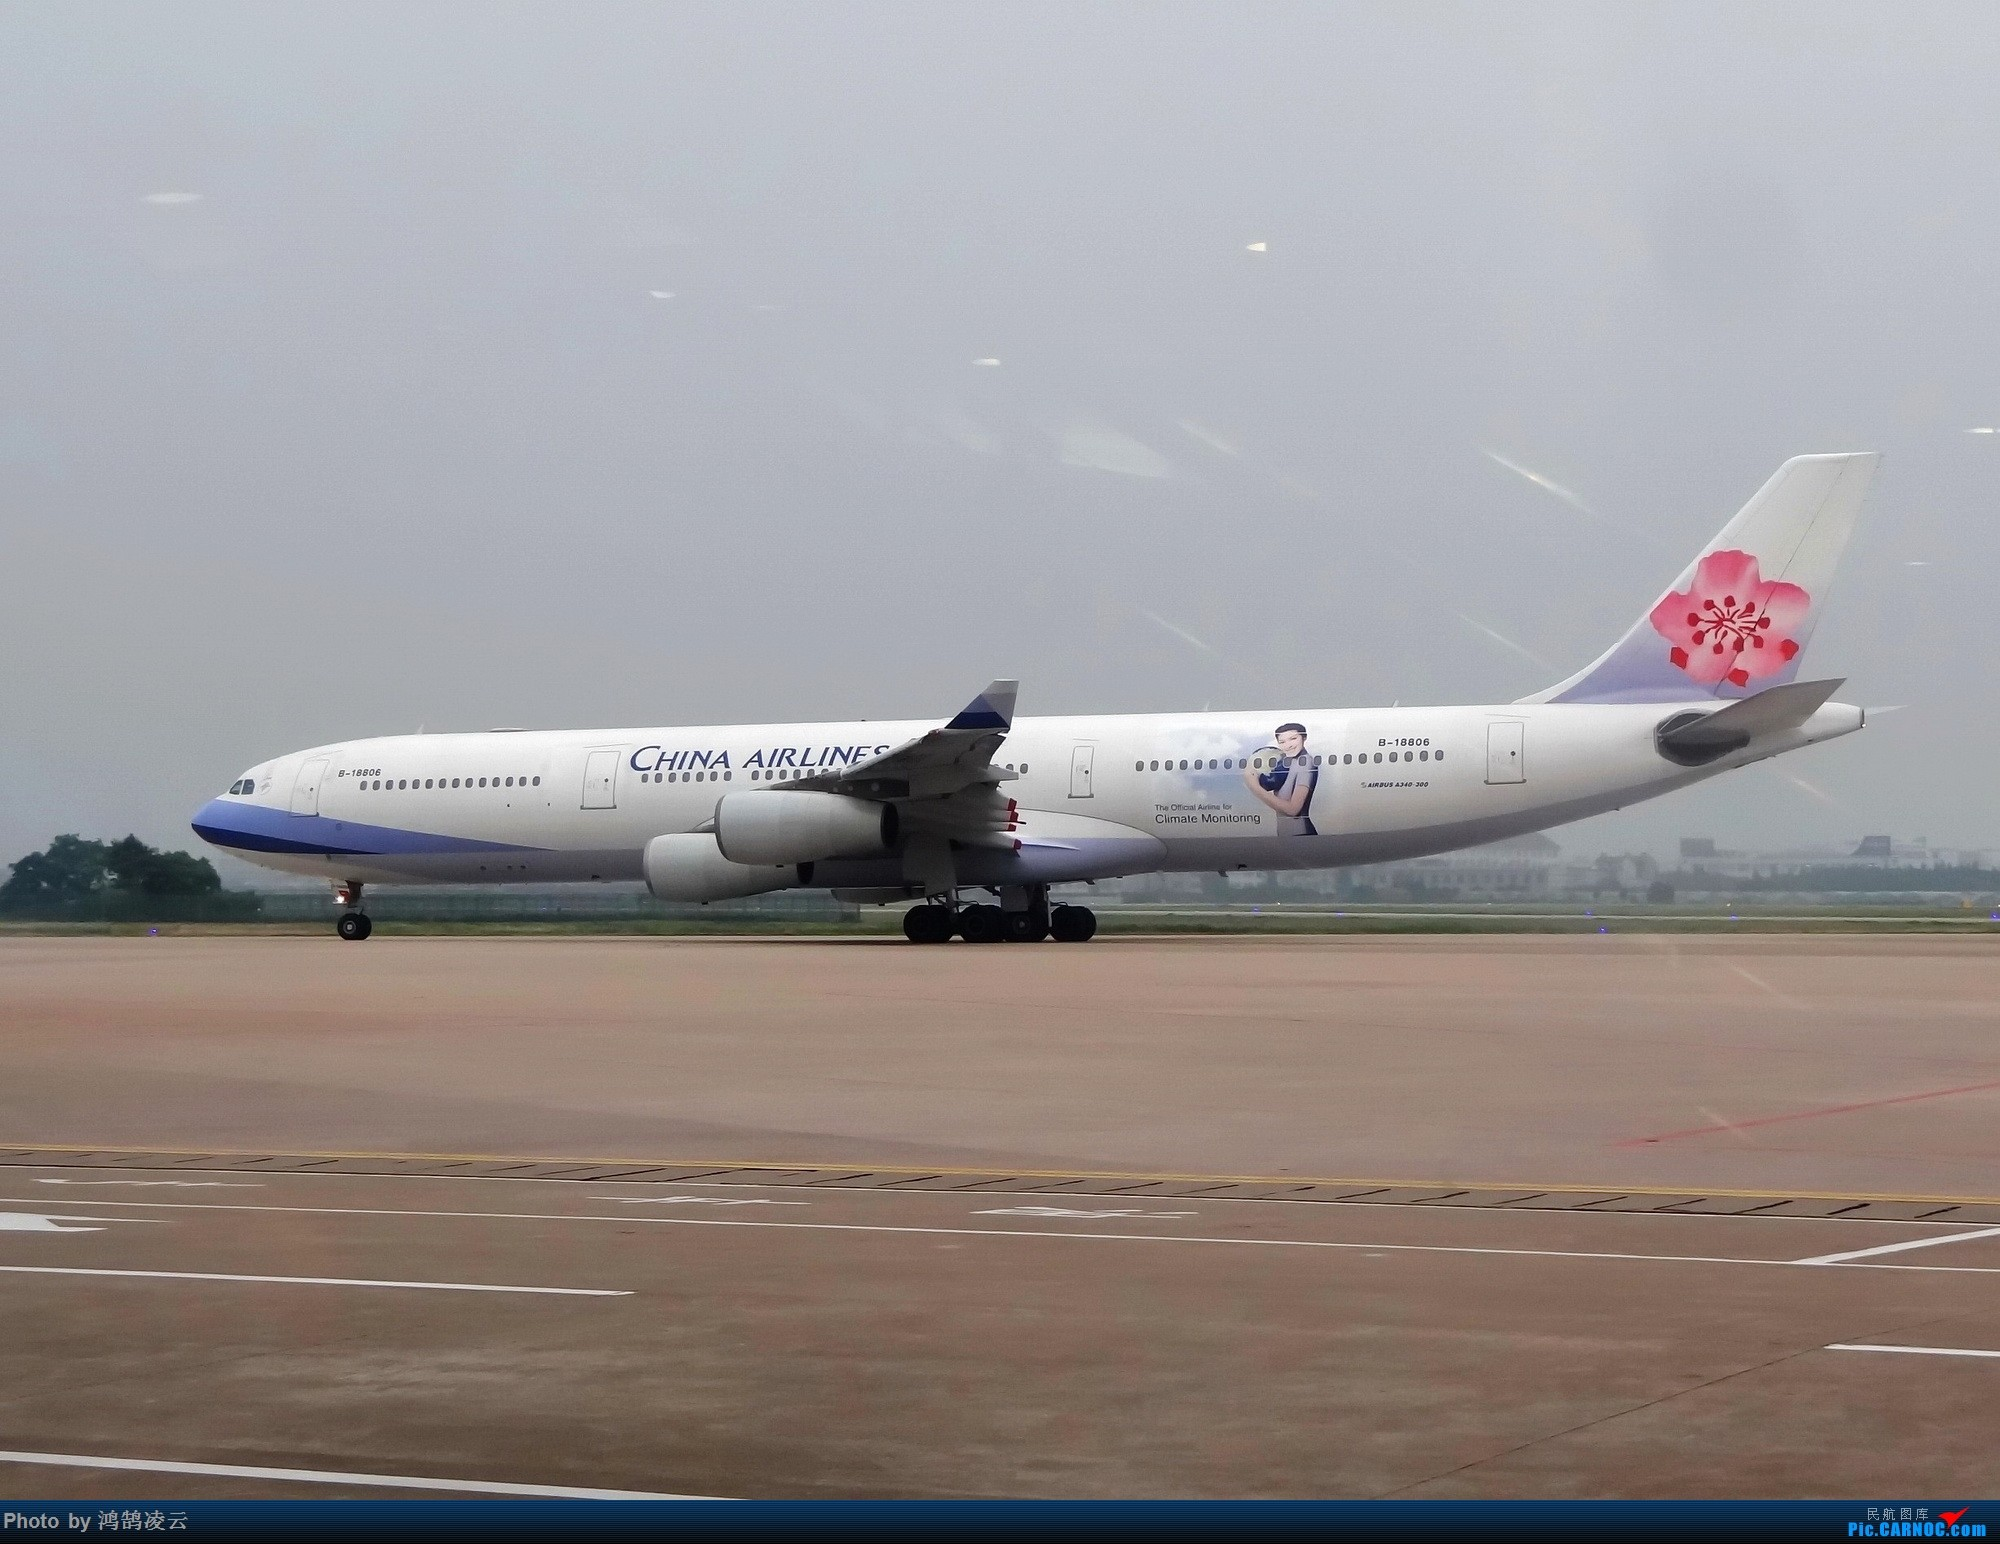 Re:[原创]【宁波飞友】宁波栎社机场仅有的几架大飞机 AIRBUS A340-300 B-18806 中国宁波栎社国际机场